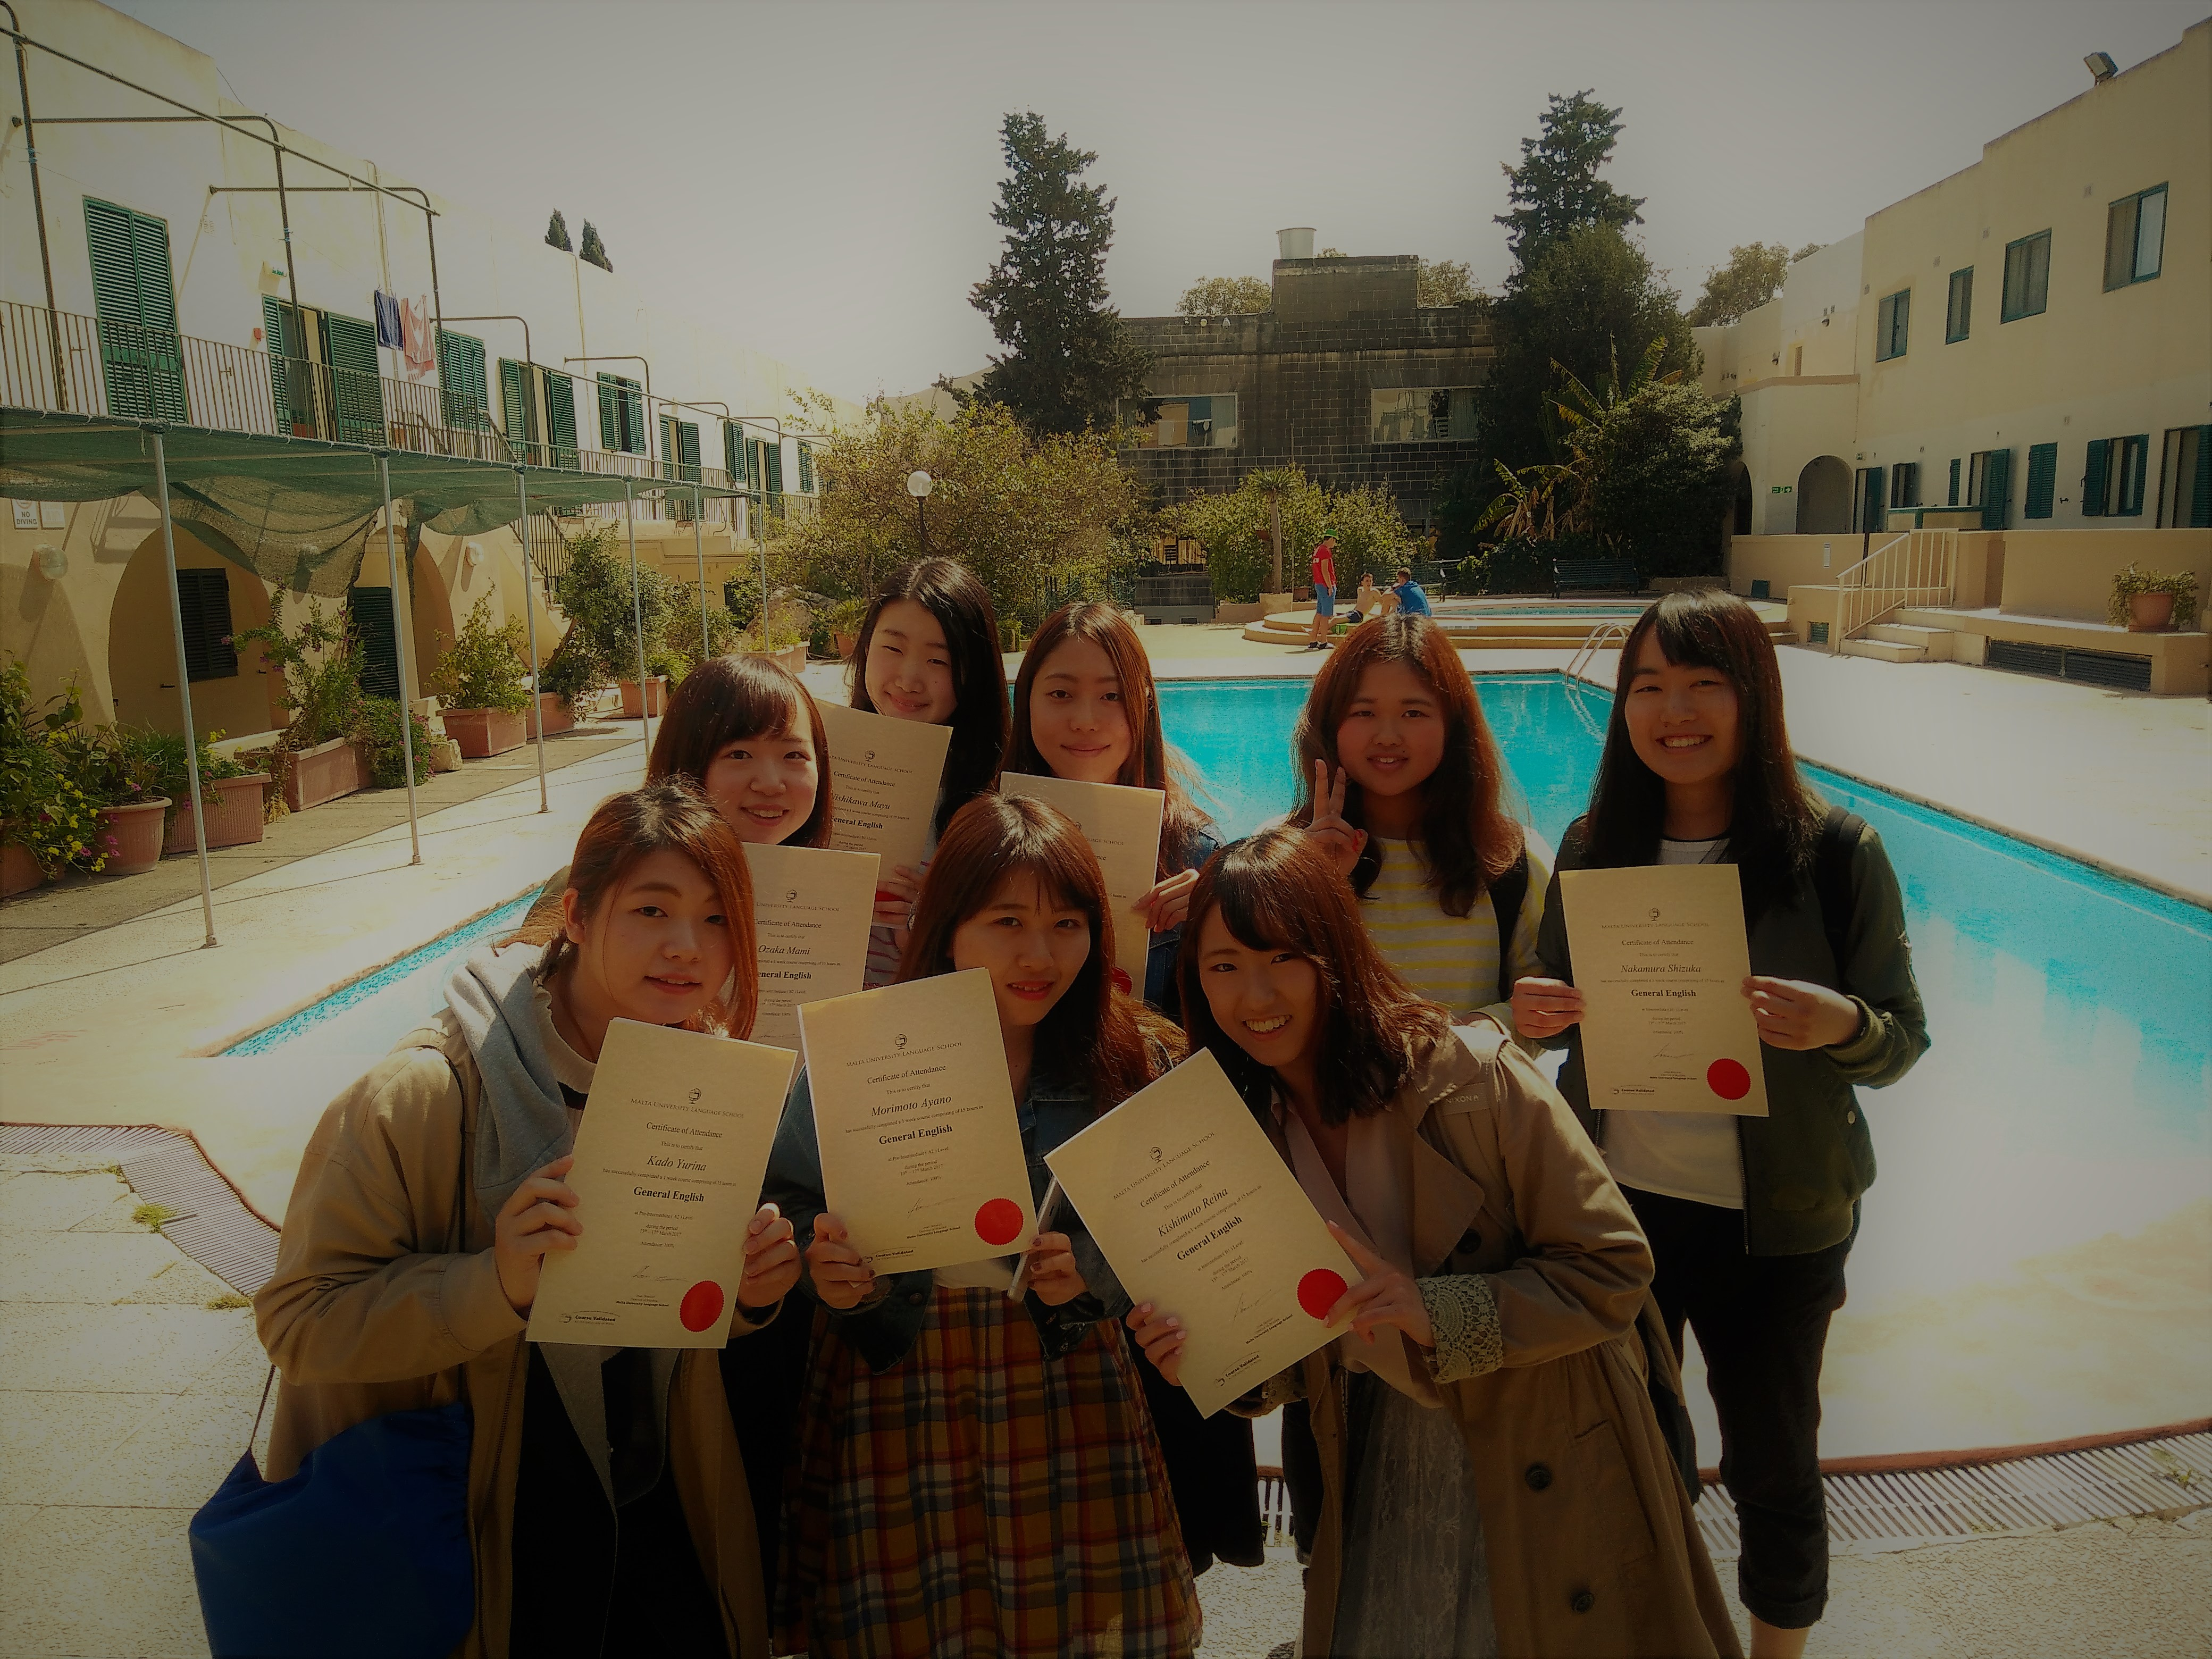 University of malta mature students